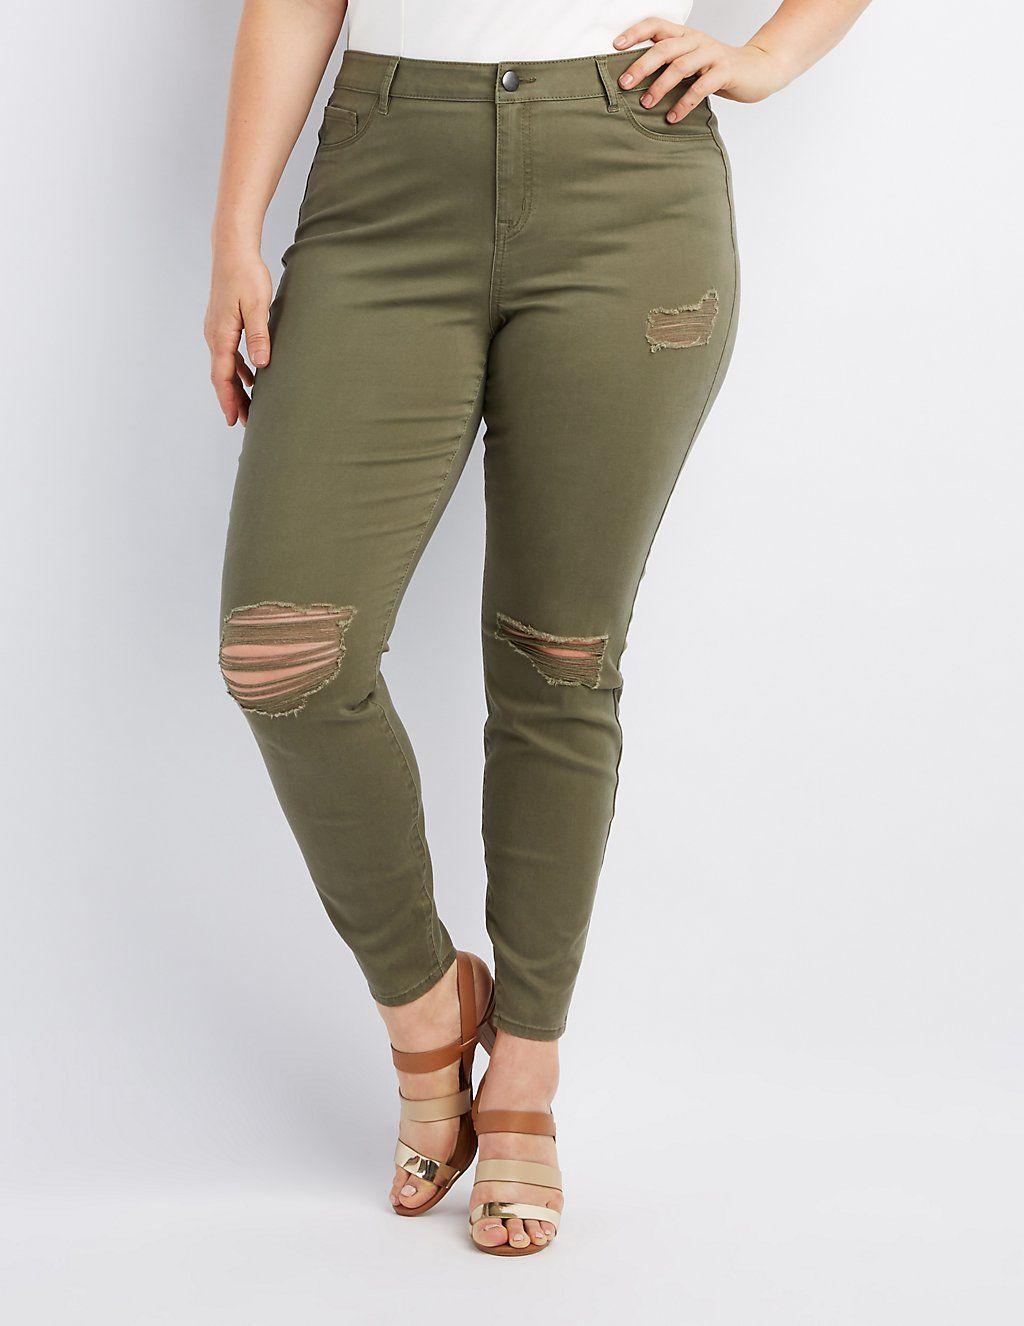 526e289508e Plus Size Refuge Skin Tight Legging Destroyed Jeans